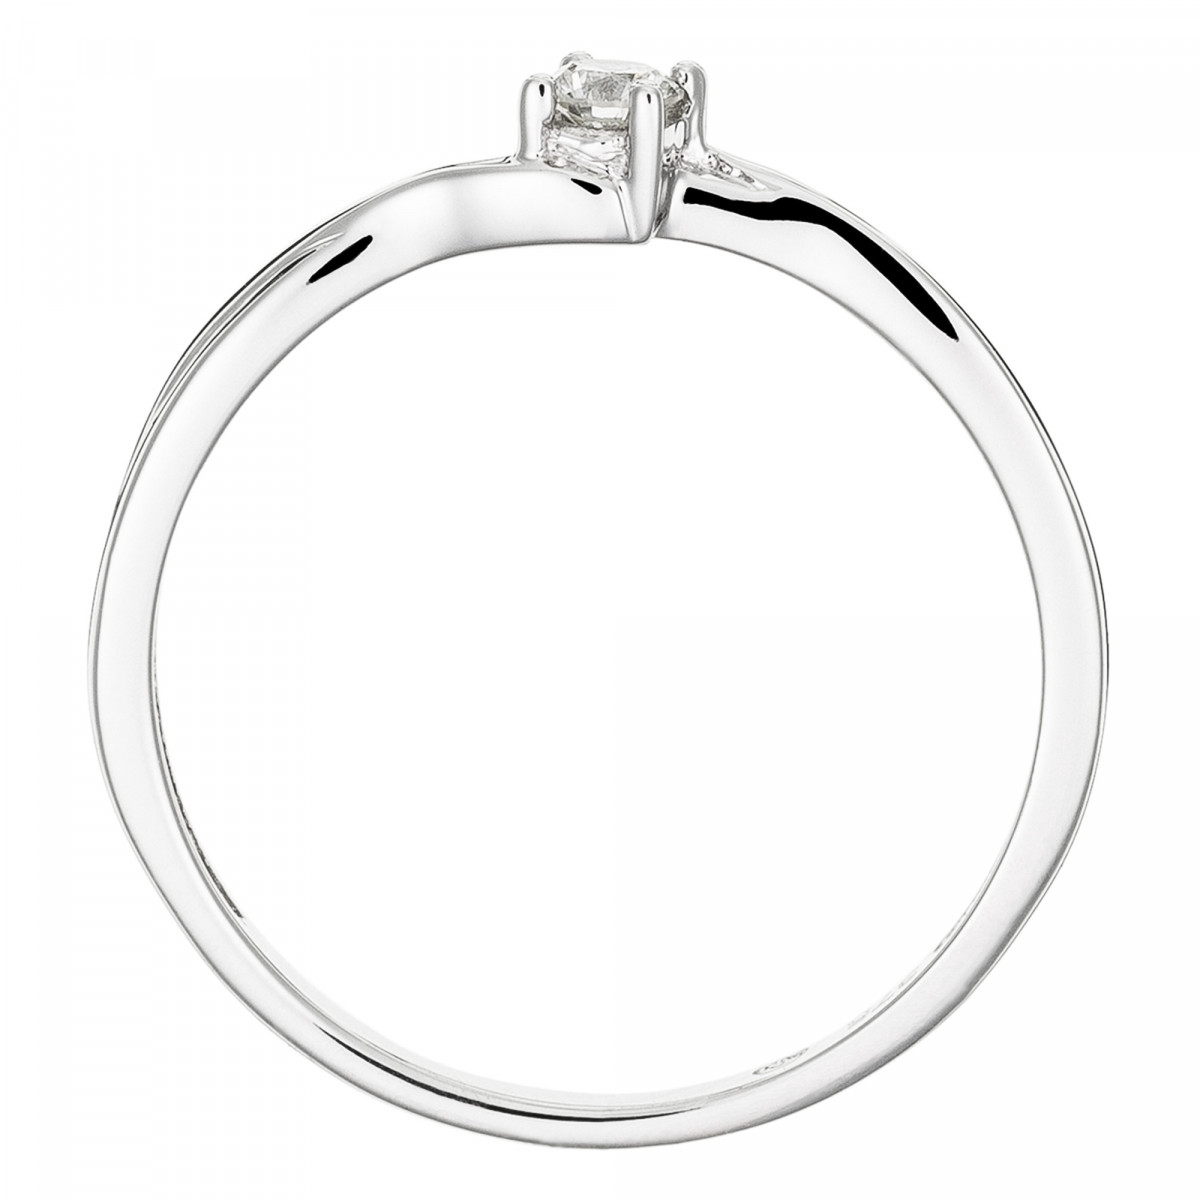 "Solitaire Or Blanc 375 ""TOURBILLON"" Diamants 0,1 carat"